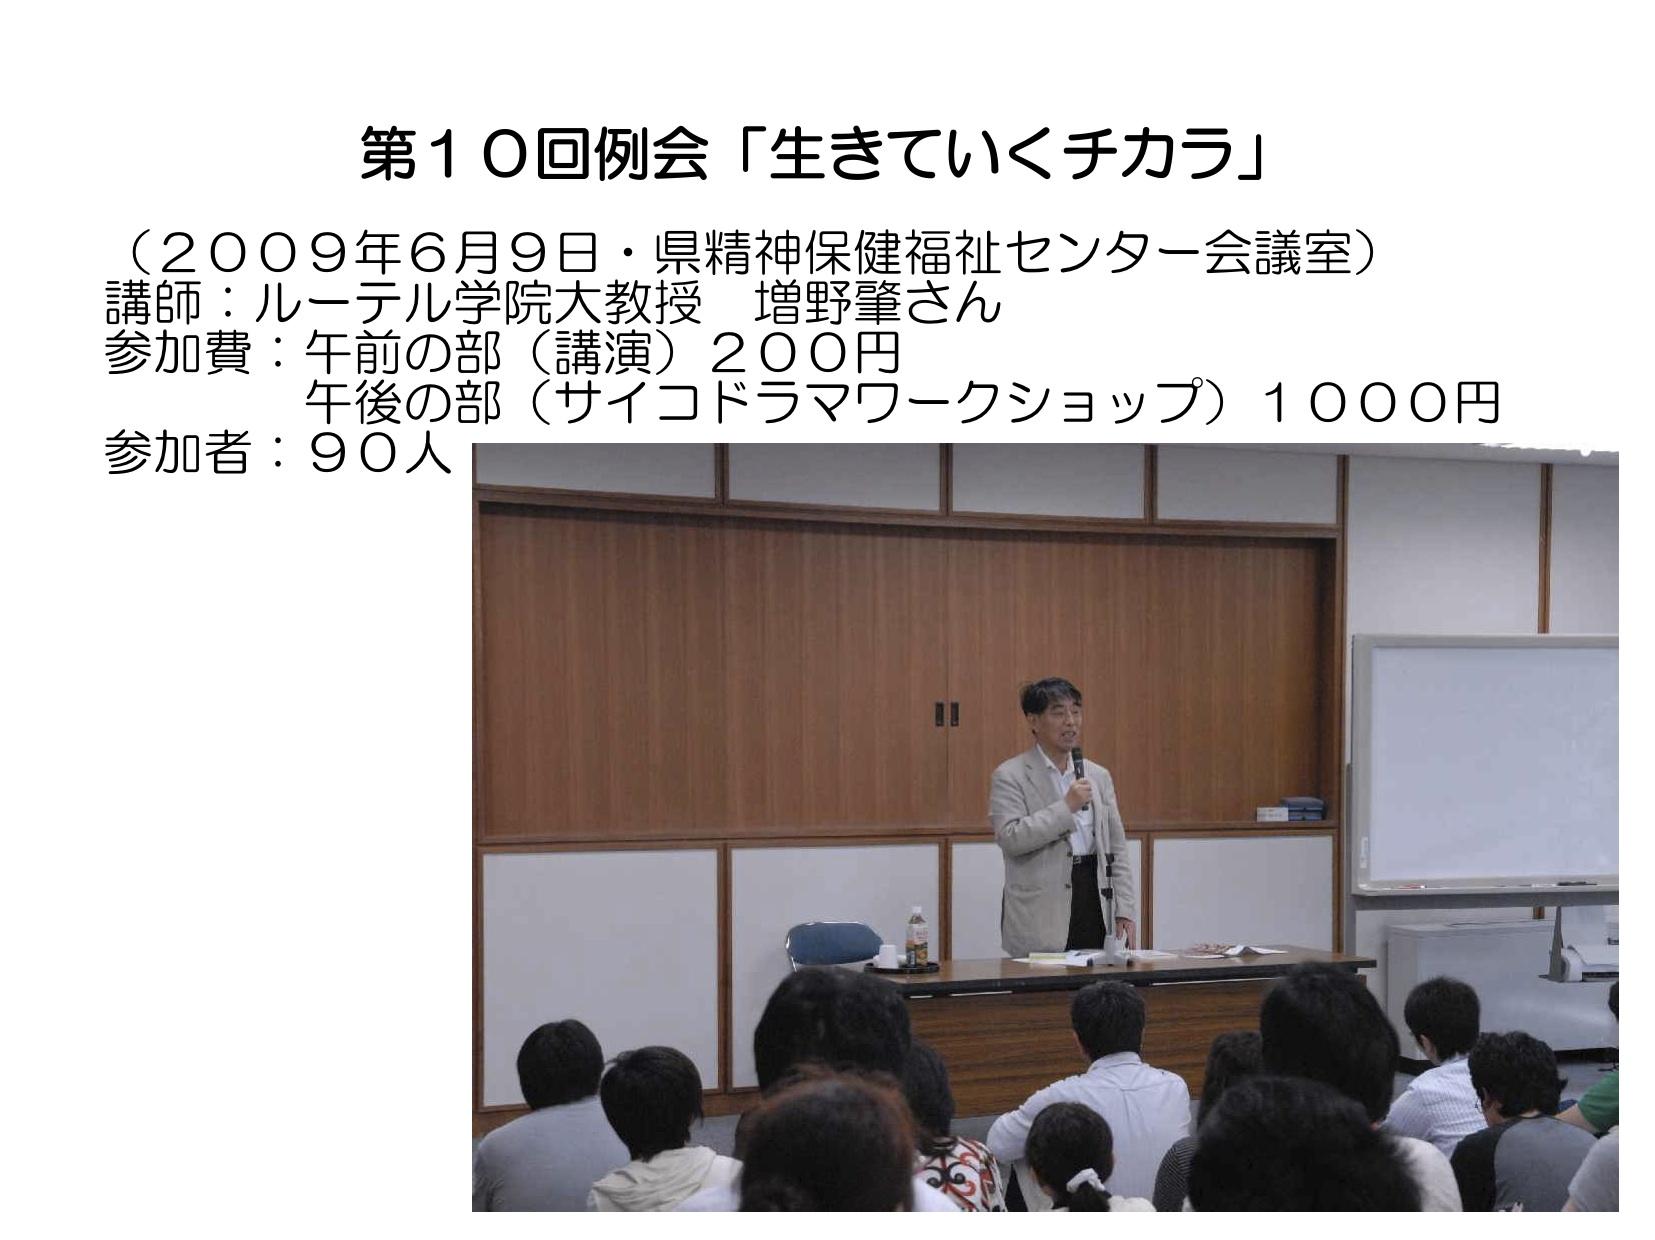 PS養成講座…パワーポイント資料③_a0103650_20455721.jpg